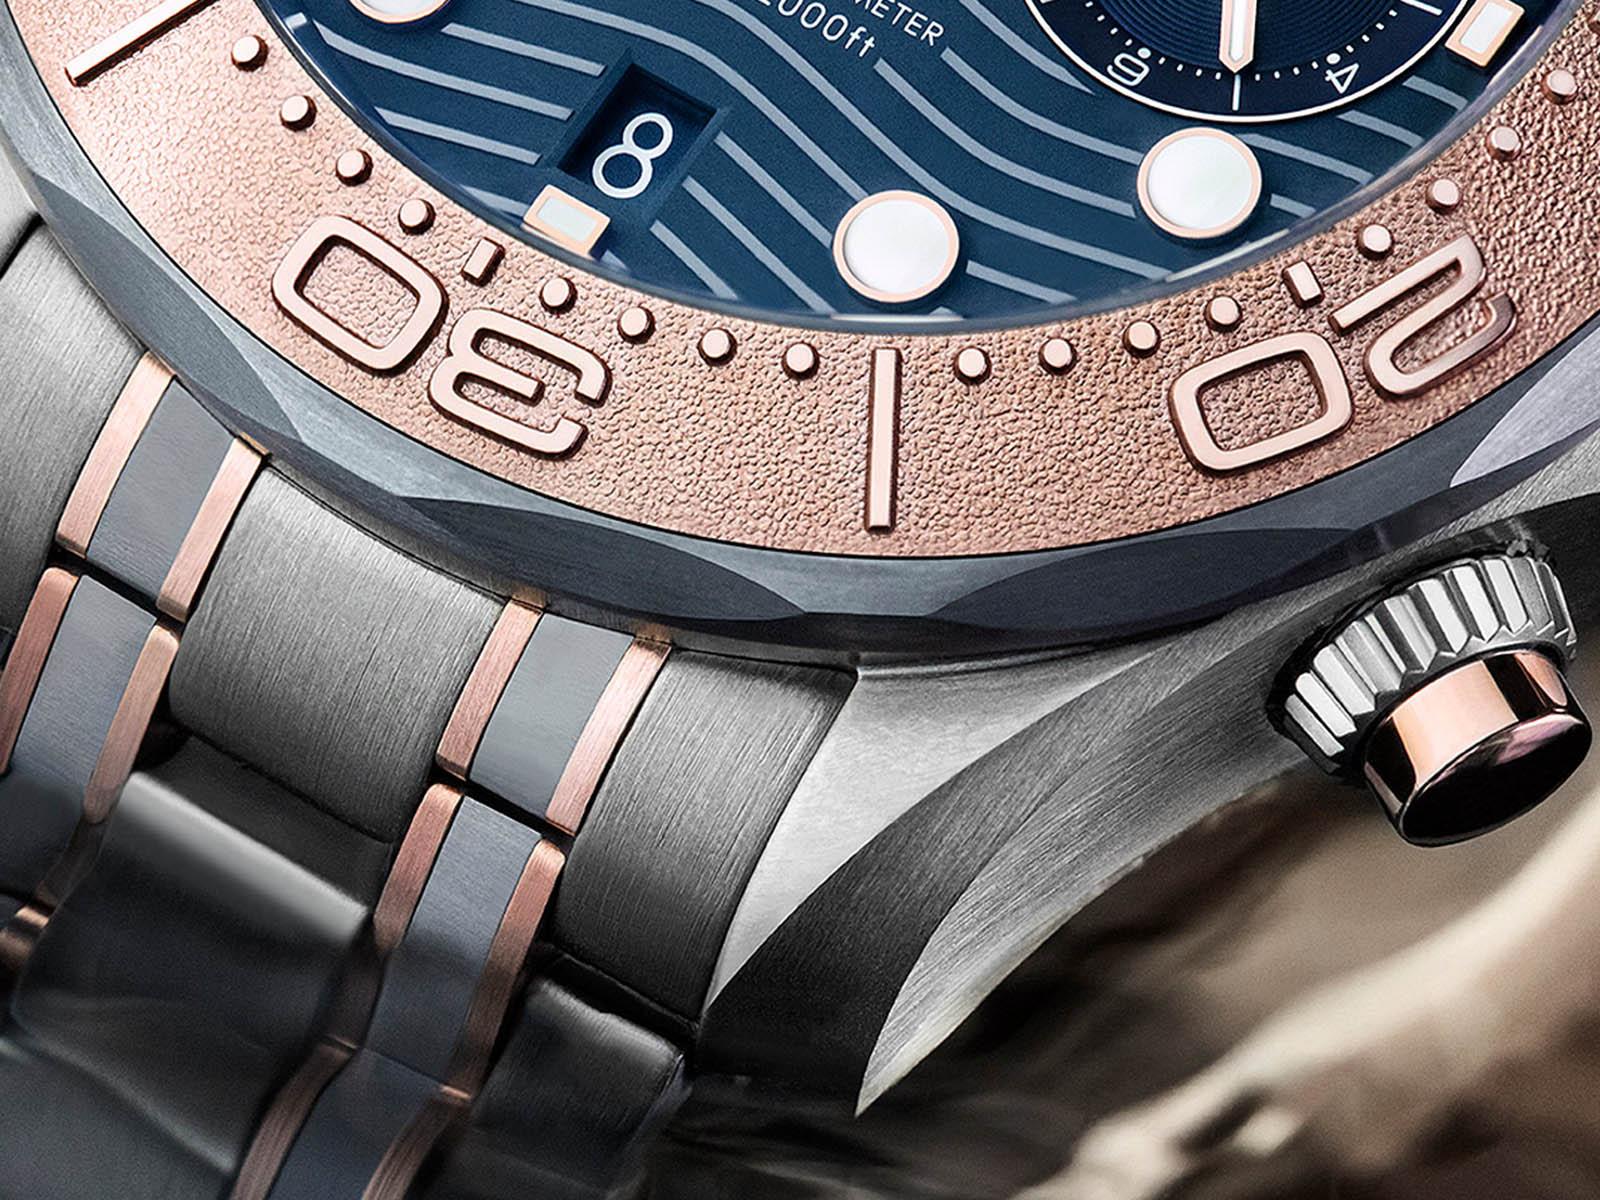 omega-seamaster-diver-300m-chronograph-gold-titanium-tantalum-4.jpg